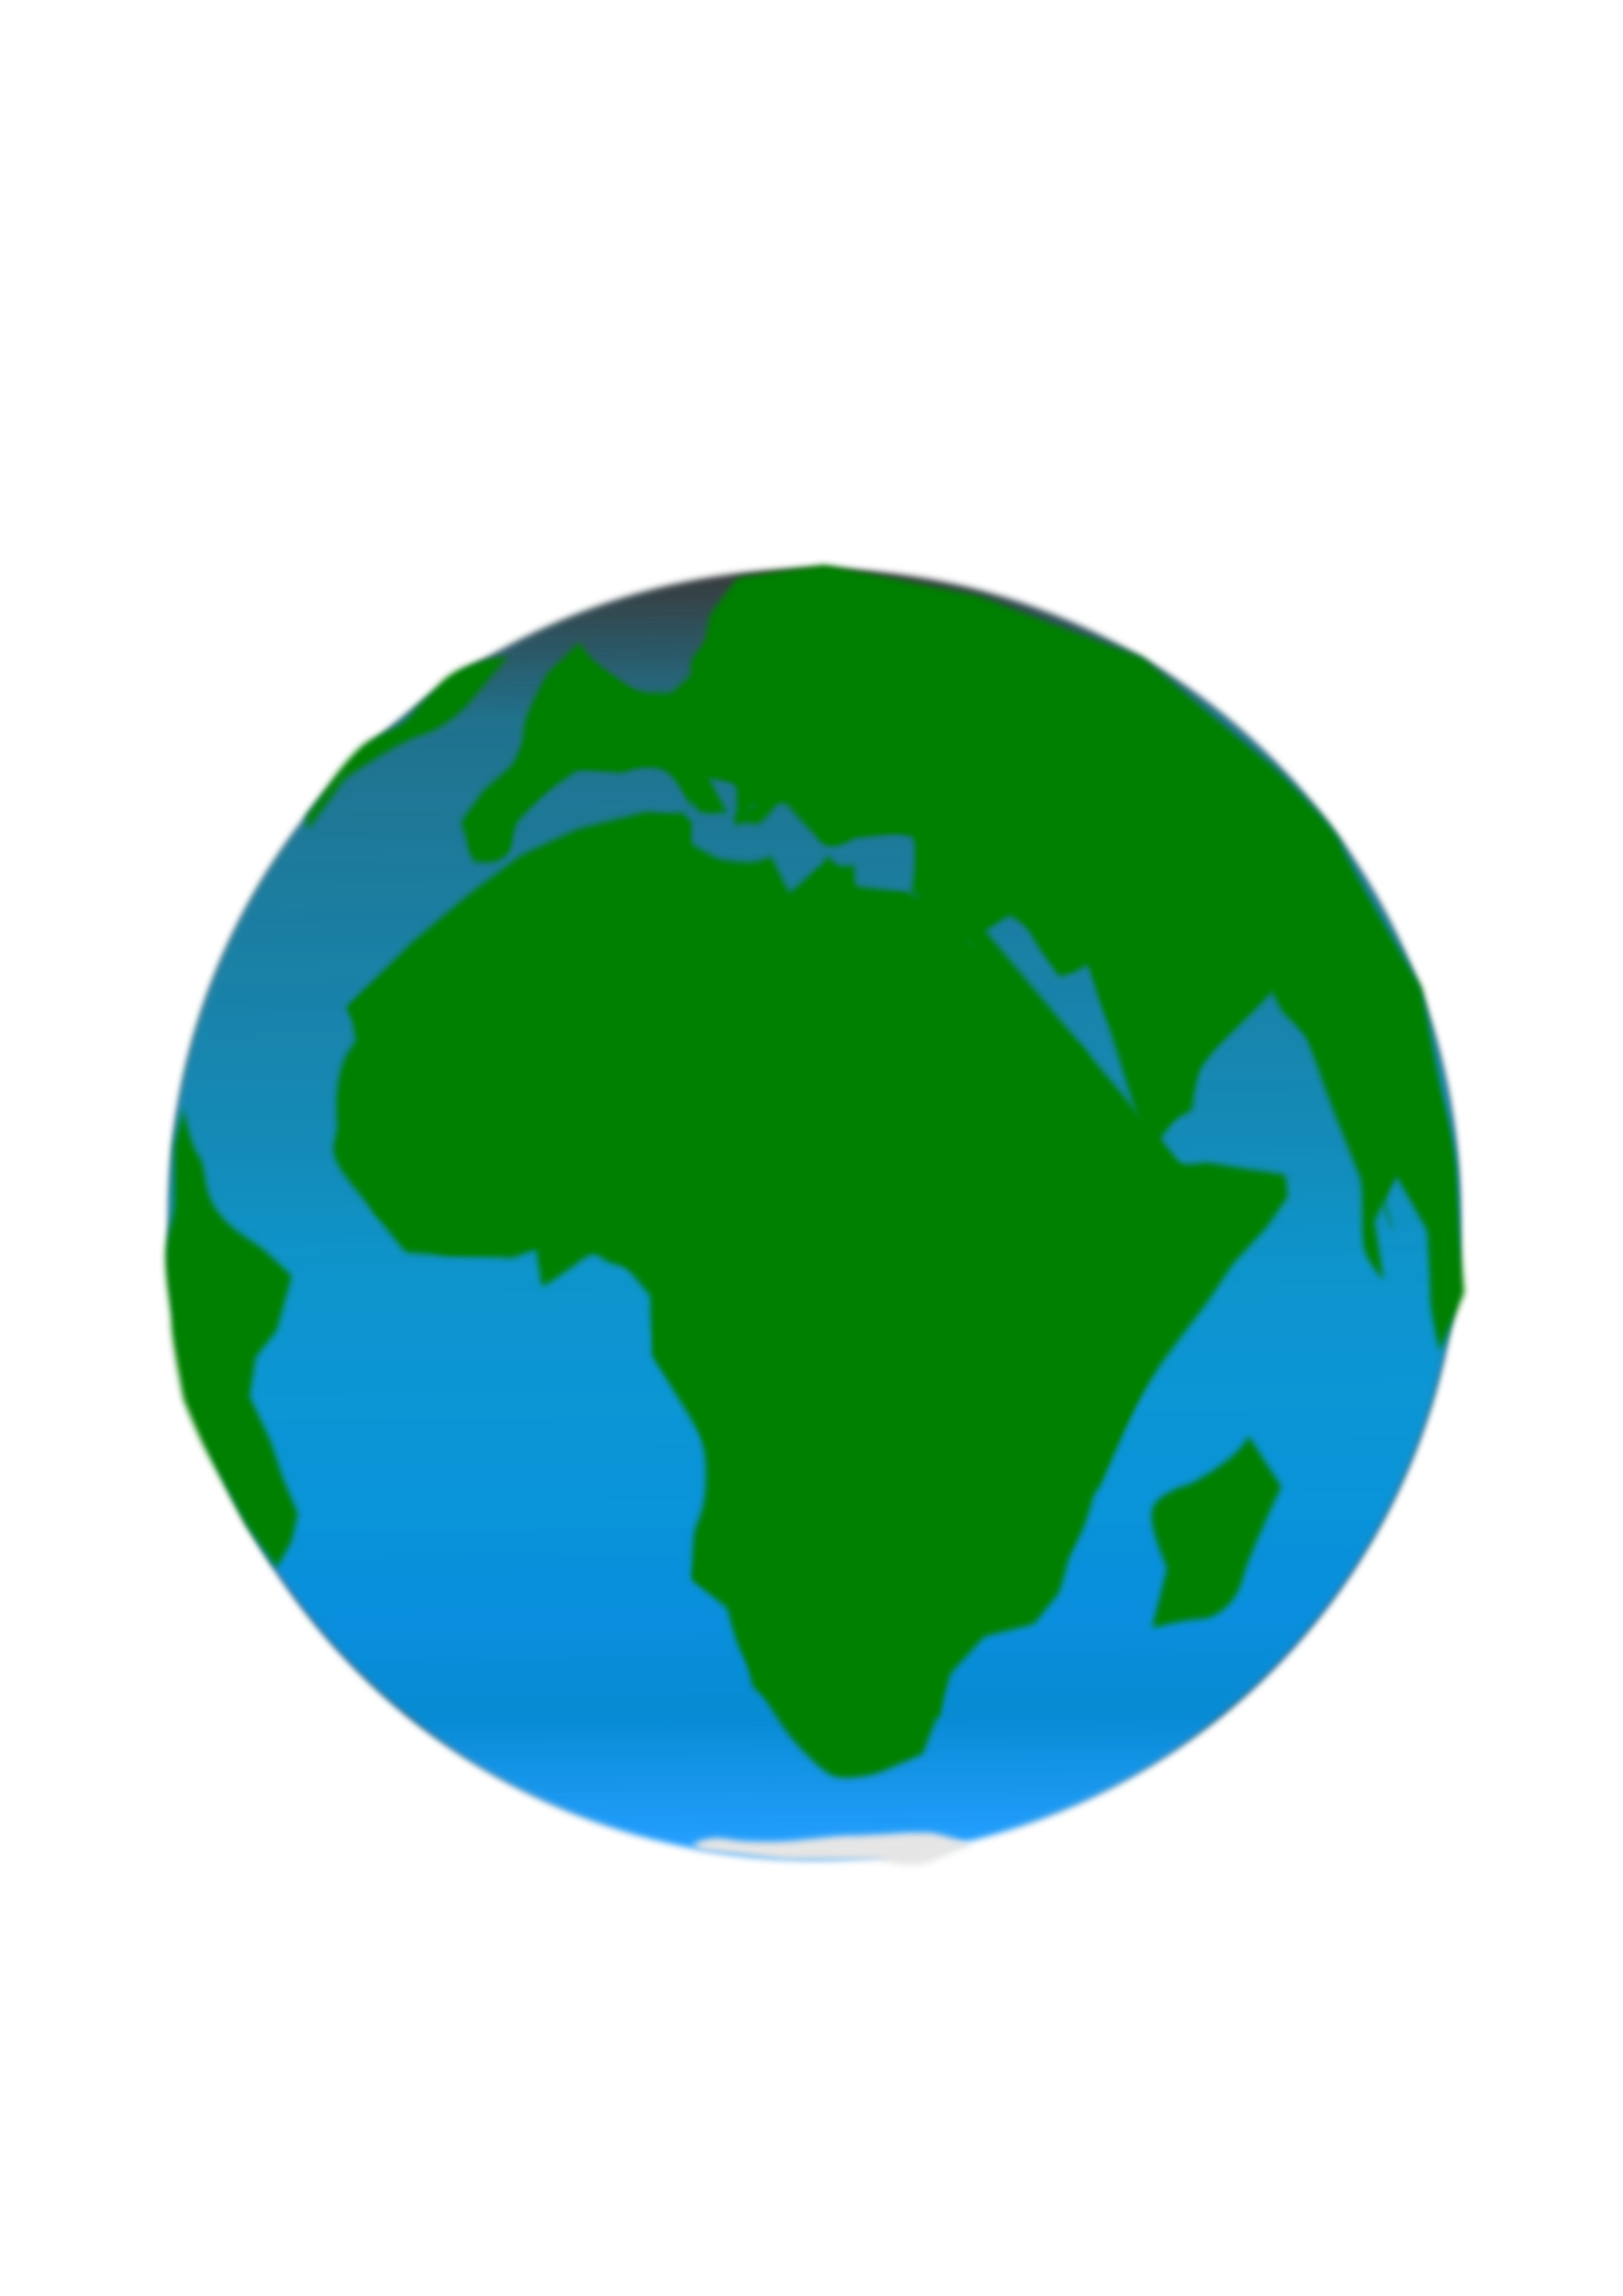 clipart mi planeta tierra clipart download free microsoft clipart download free